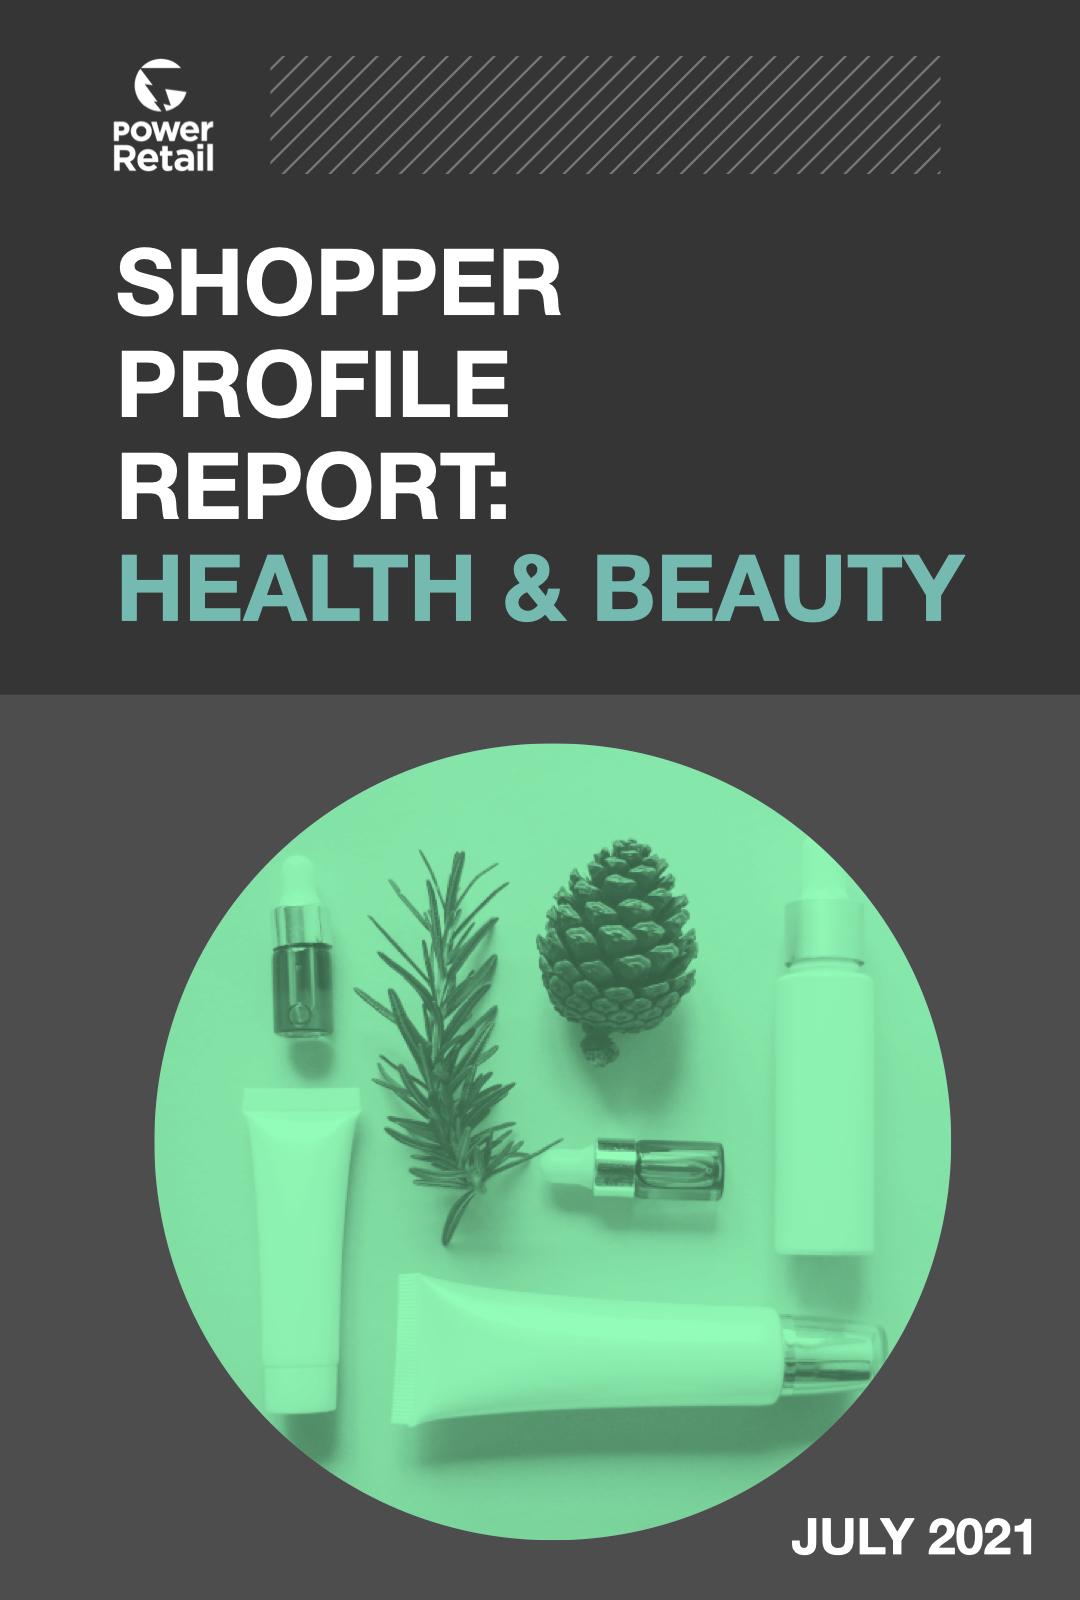 Shopper Profile Report: Health & Beauty